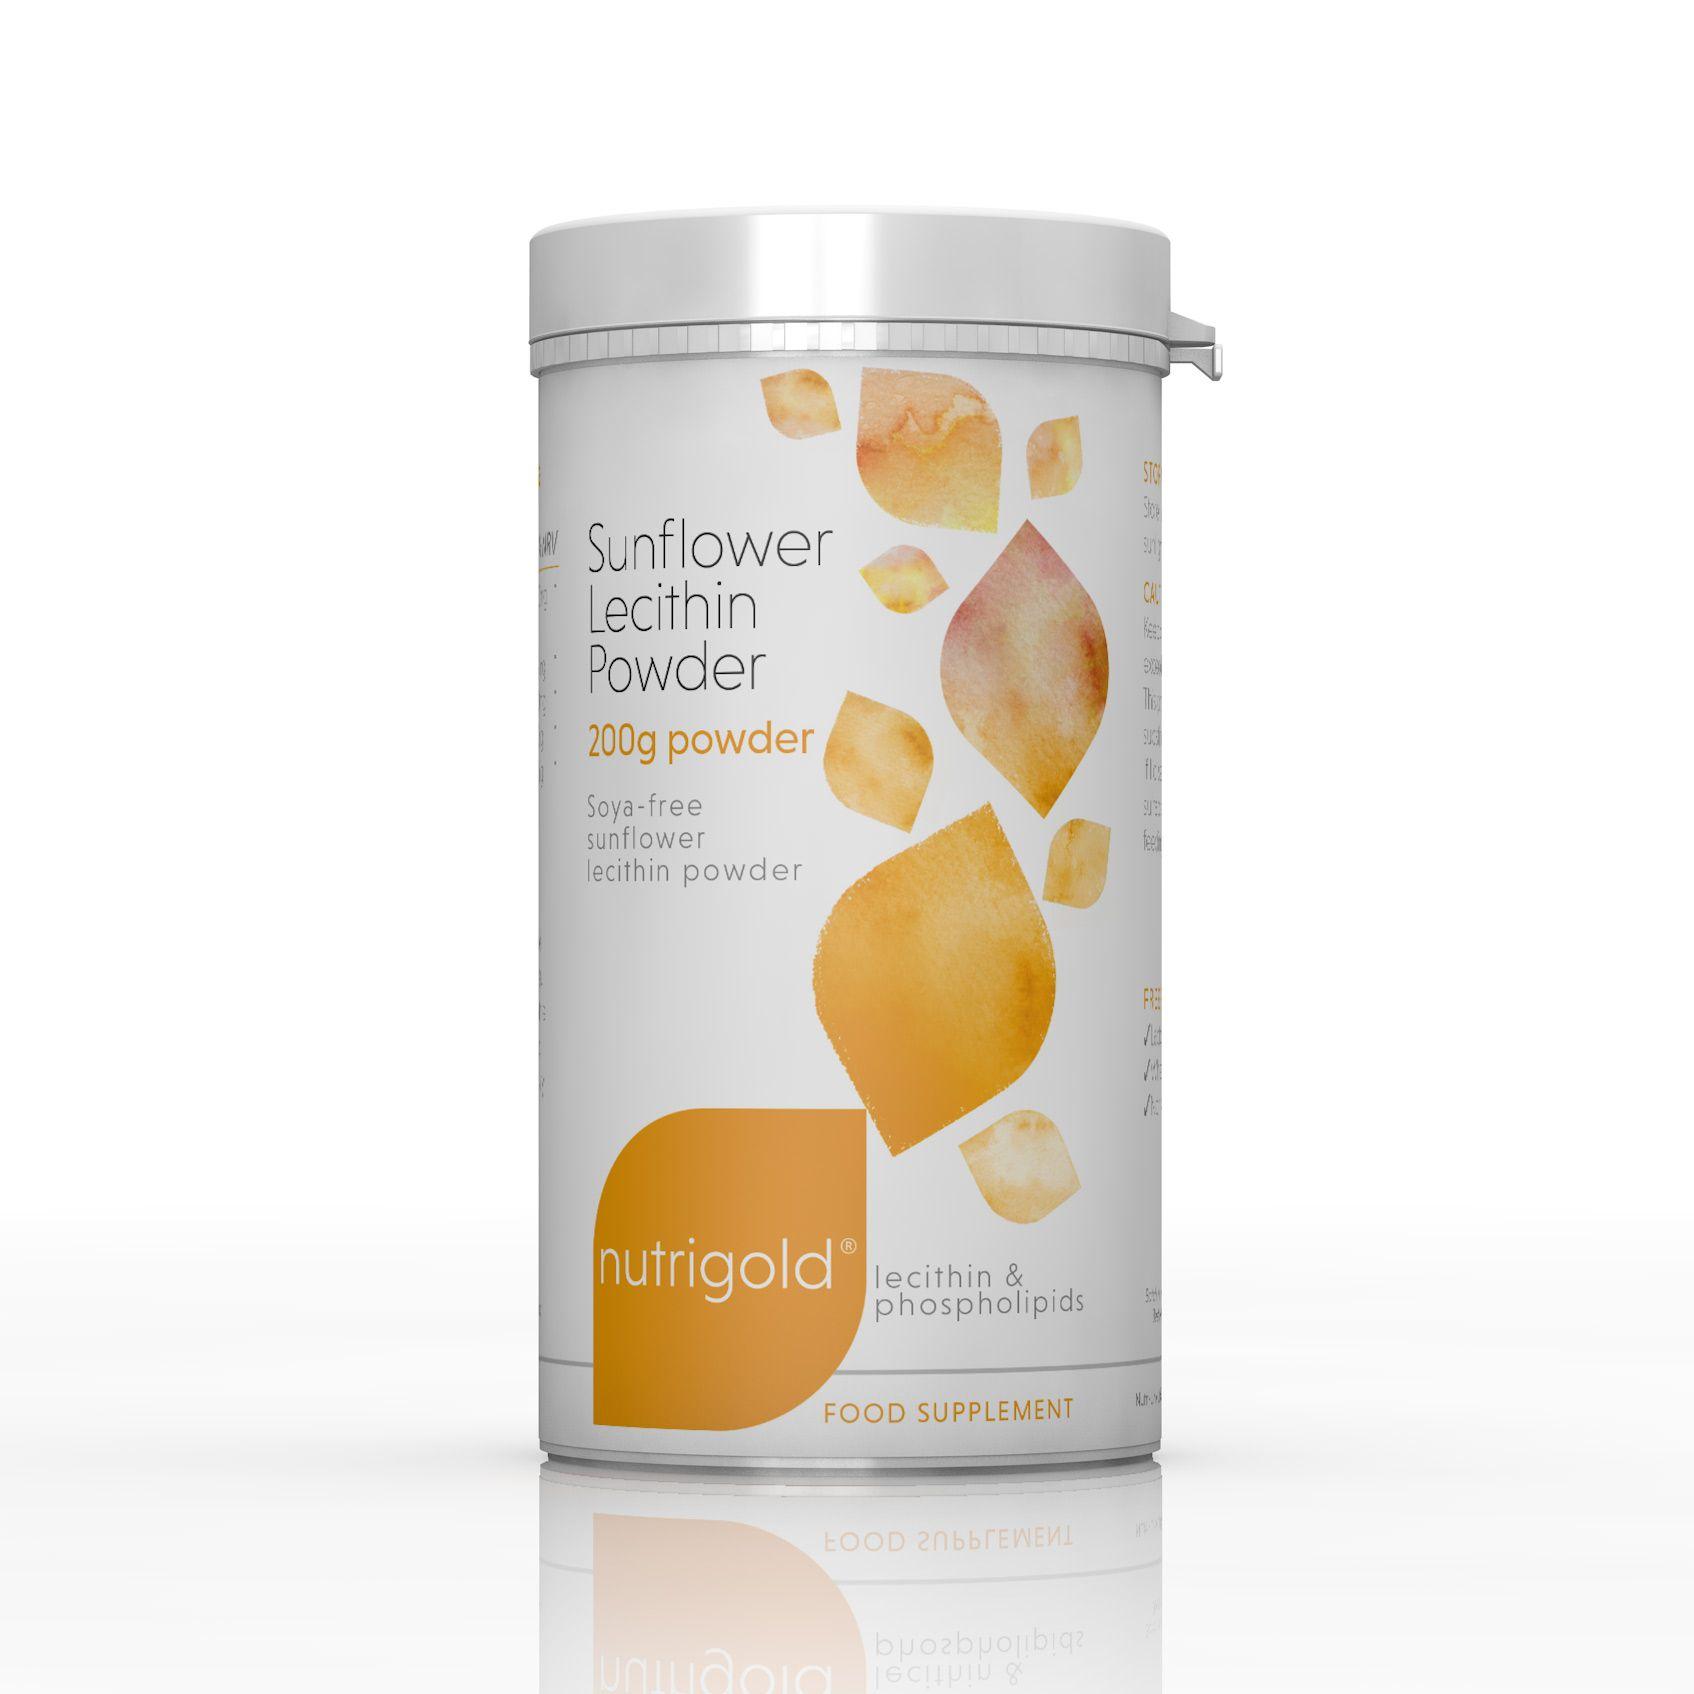 Sunflower Lecithin Powder 200g